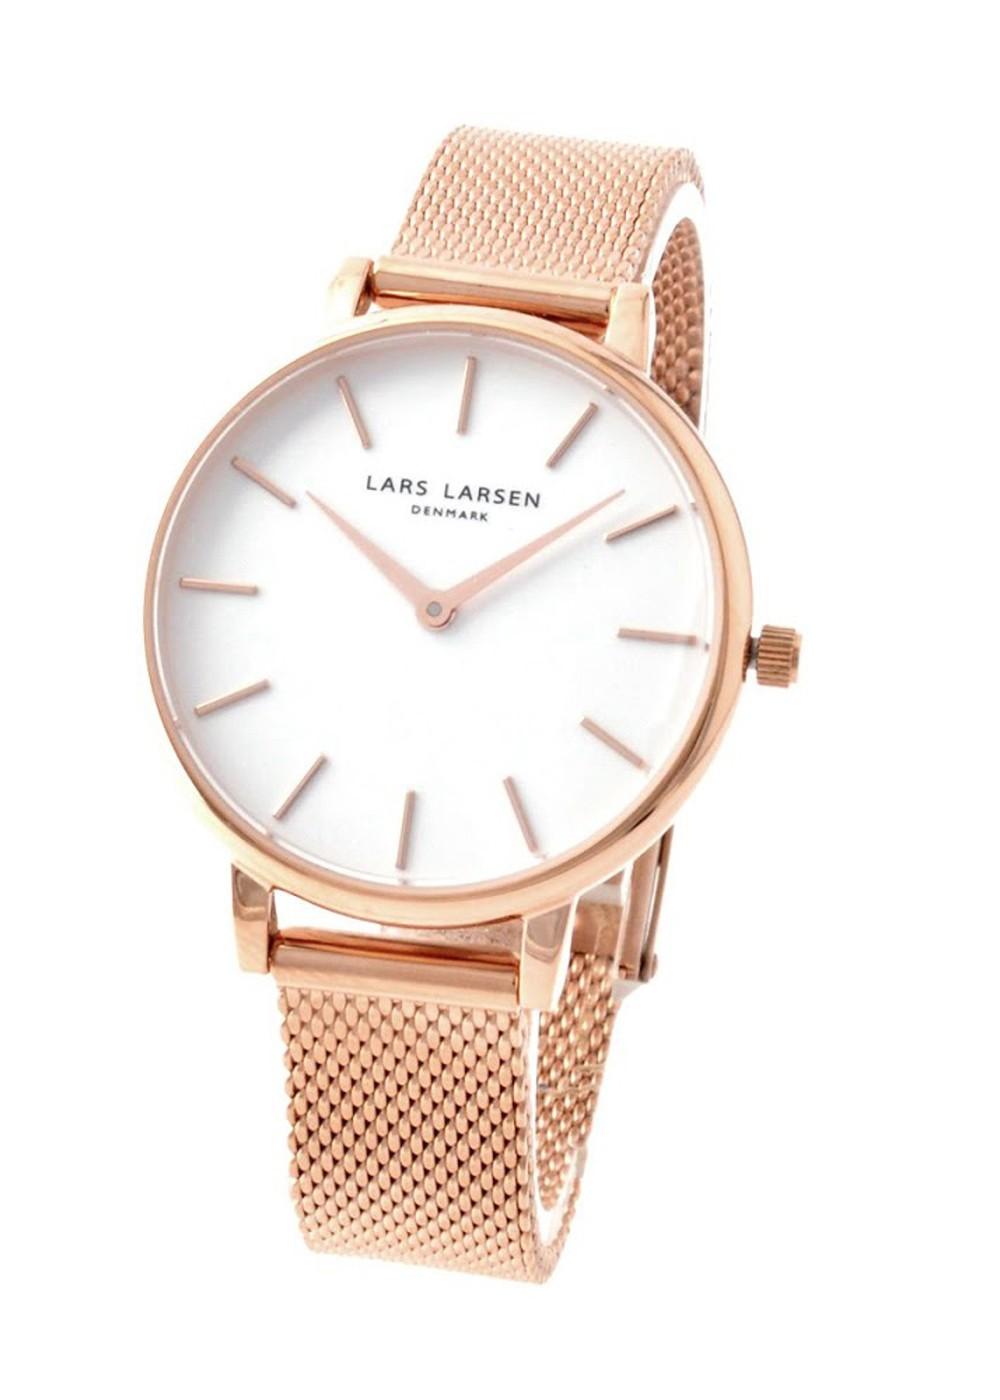 d3aa5a2b0a48 ... Larsen】腕時計 ローズゴールド レディース腕時計 オンラインファミリーセール ...